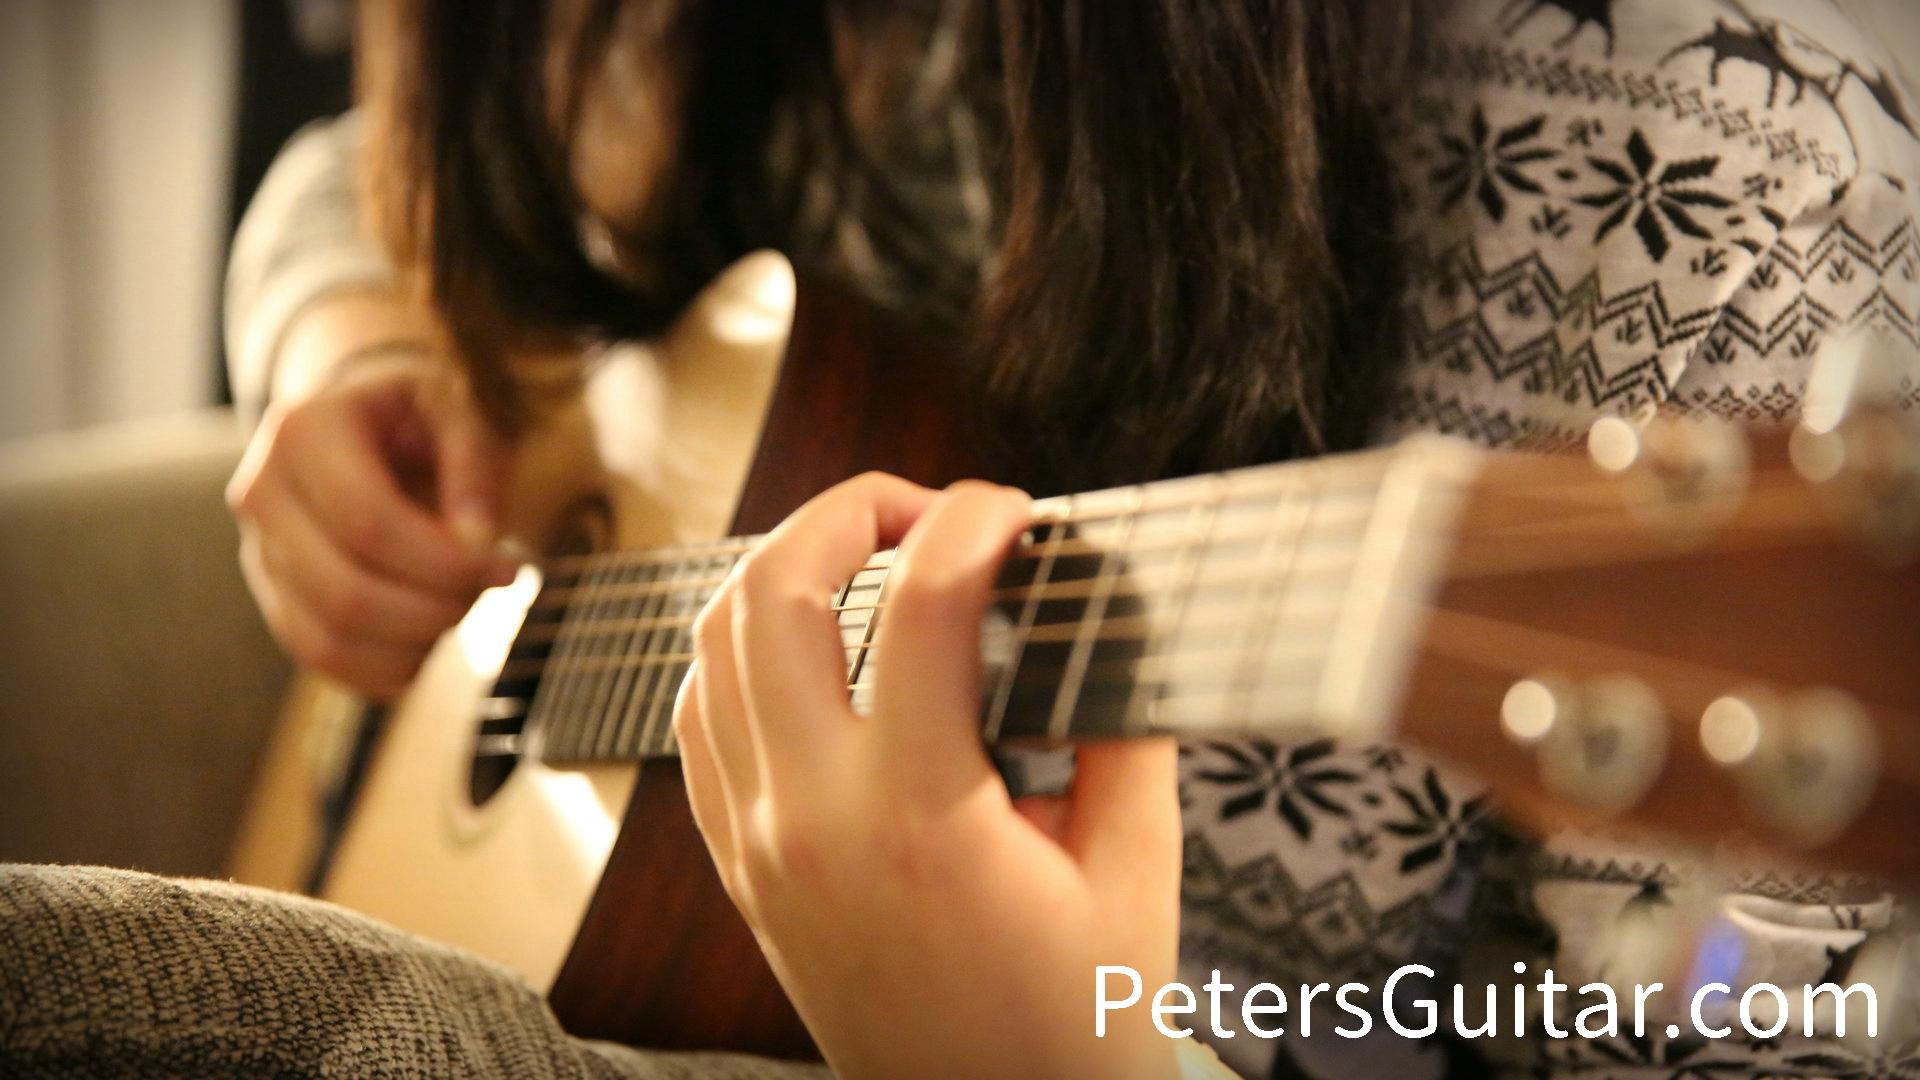 PetersGuitar_com 功夫吉他 温哥华吉他老师24.jpg